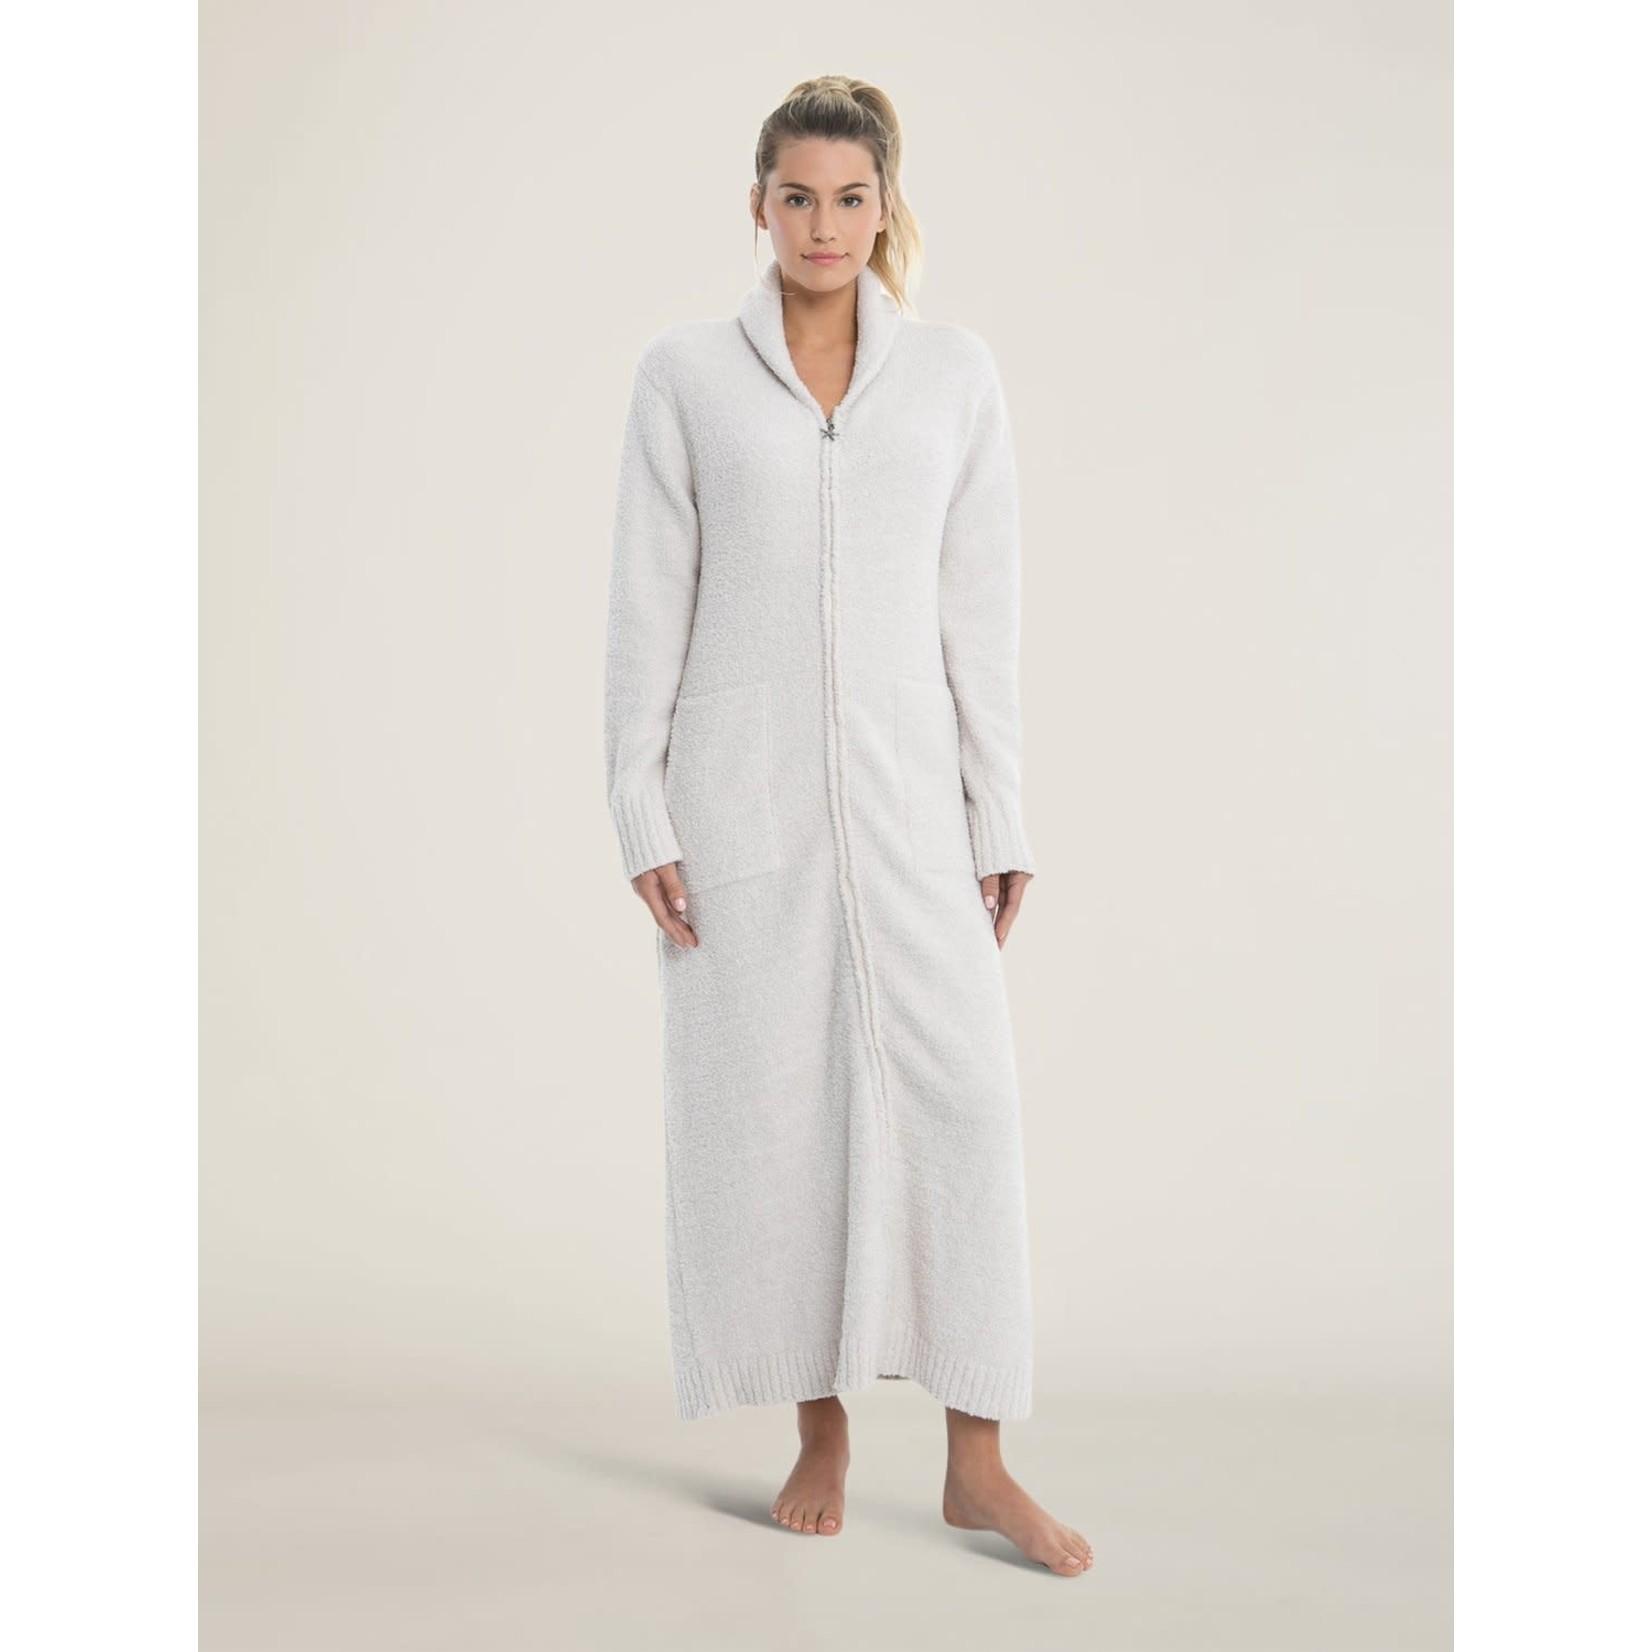 Barefoot Dreams CozyChic Full Zip Robe in Almond